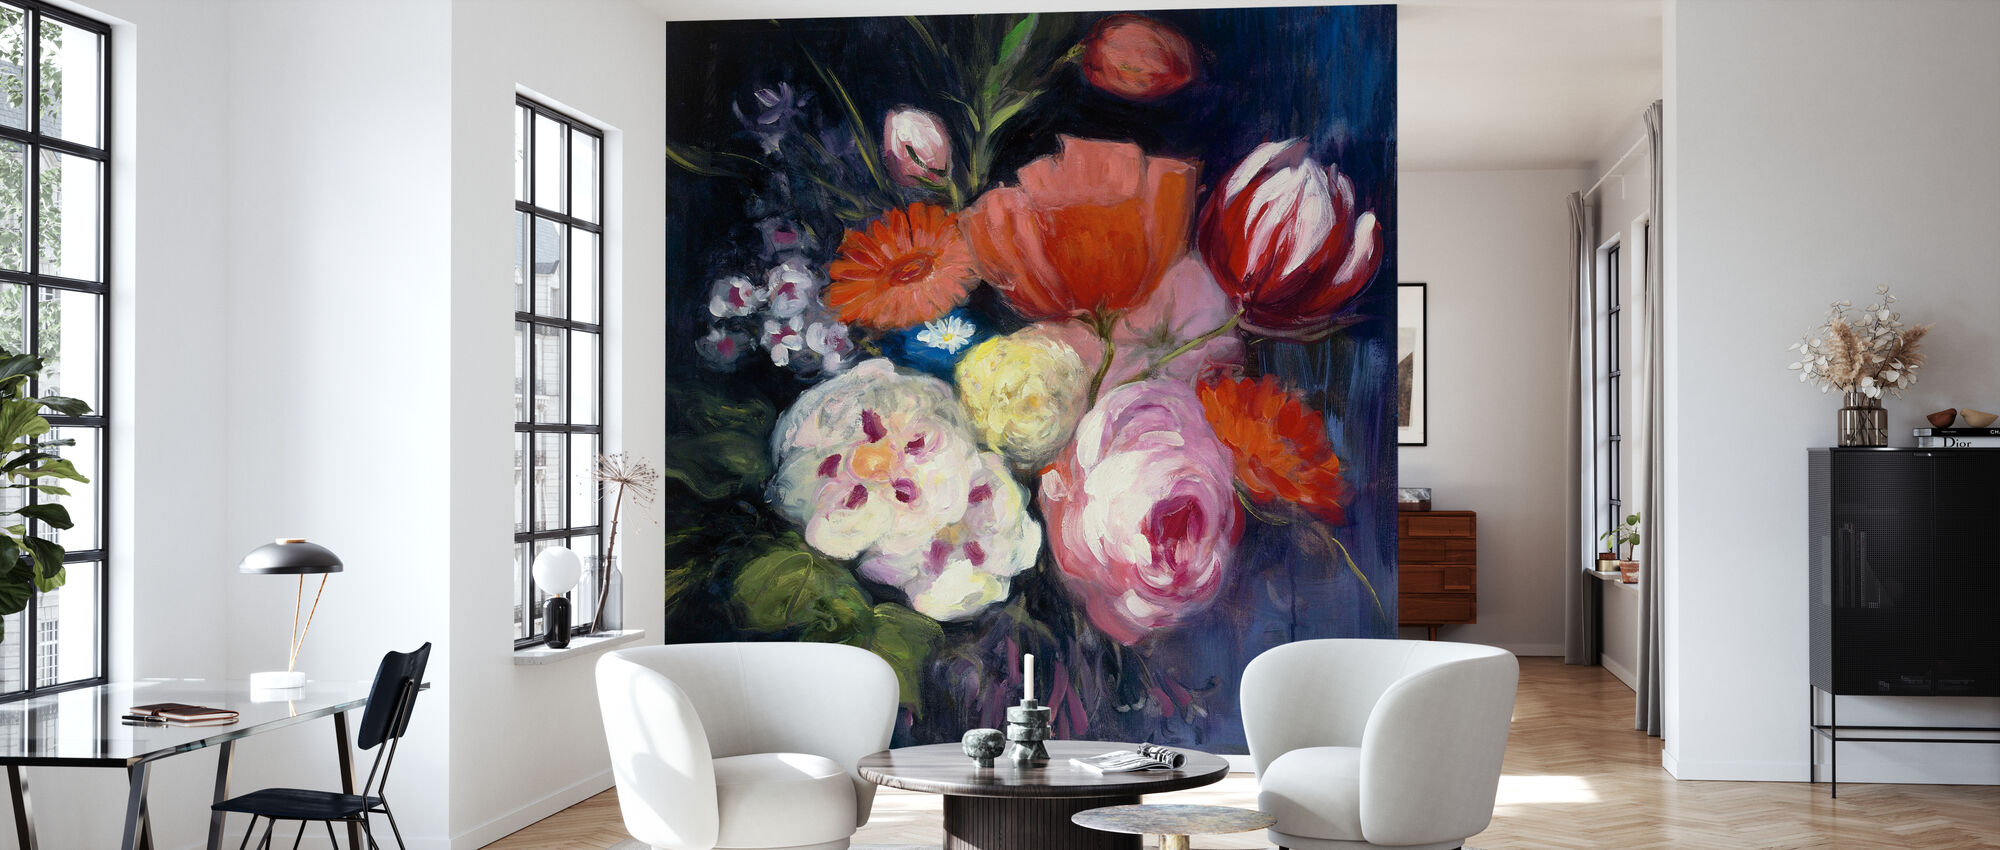 Fresh Cut - Wallpaper - Living Room